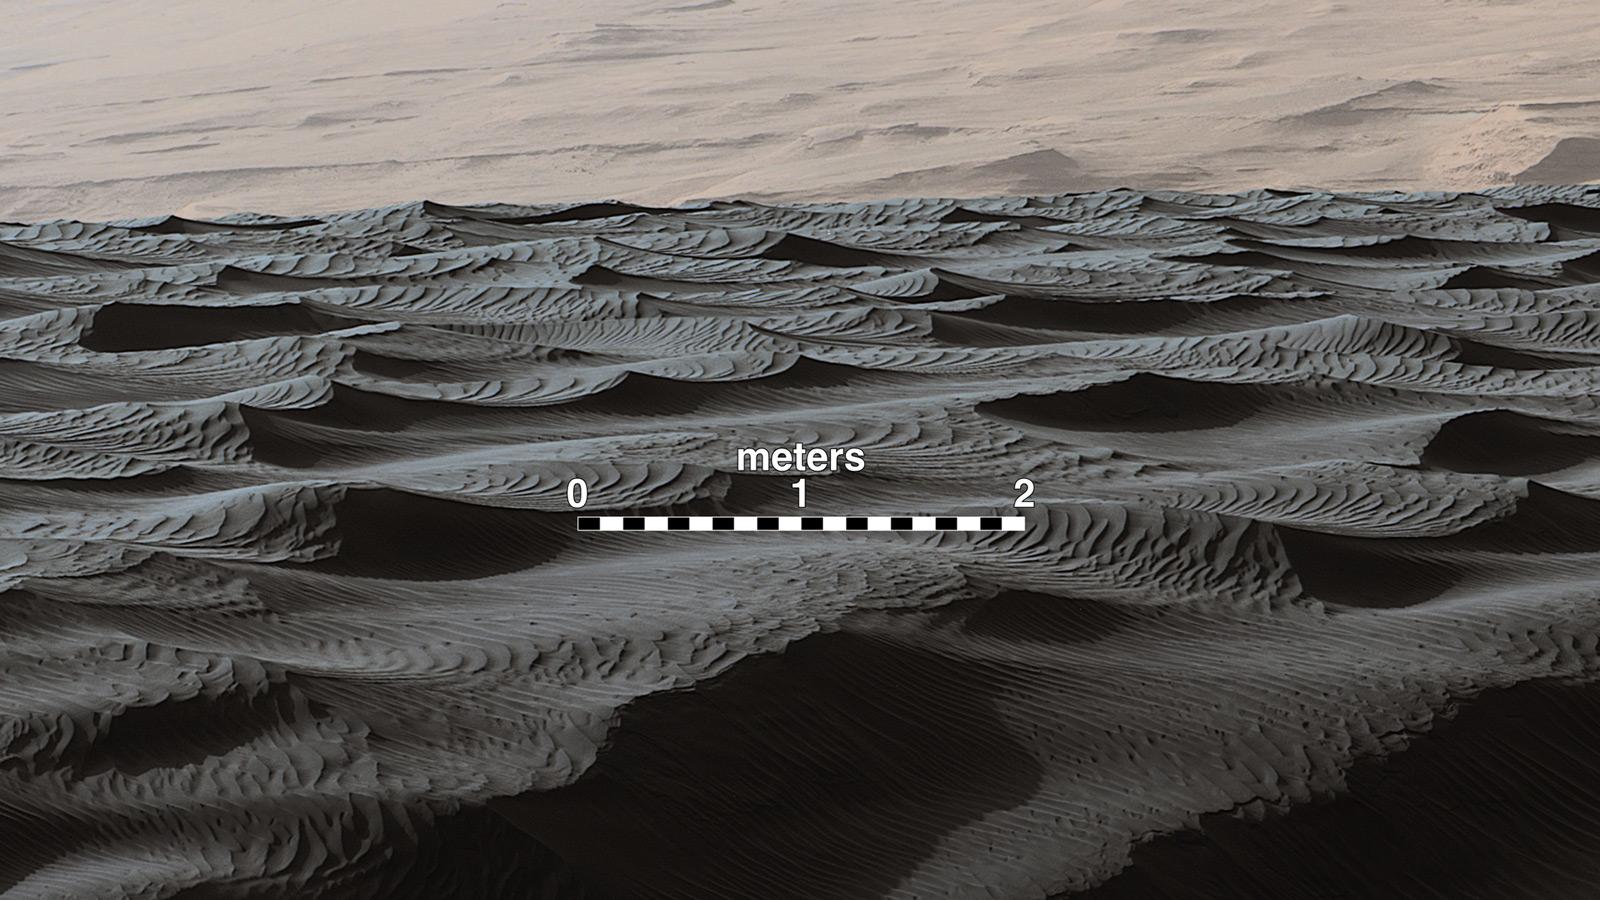 NASA Rover's sand-dune studies yield surprise - The ...